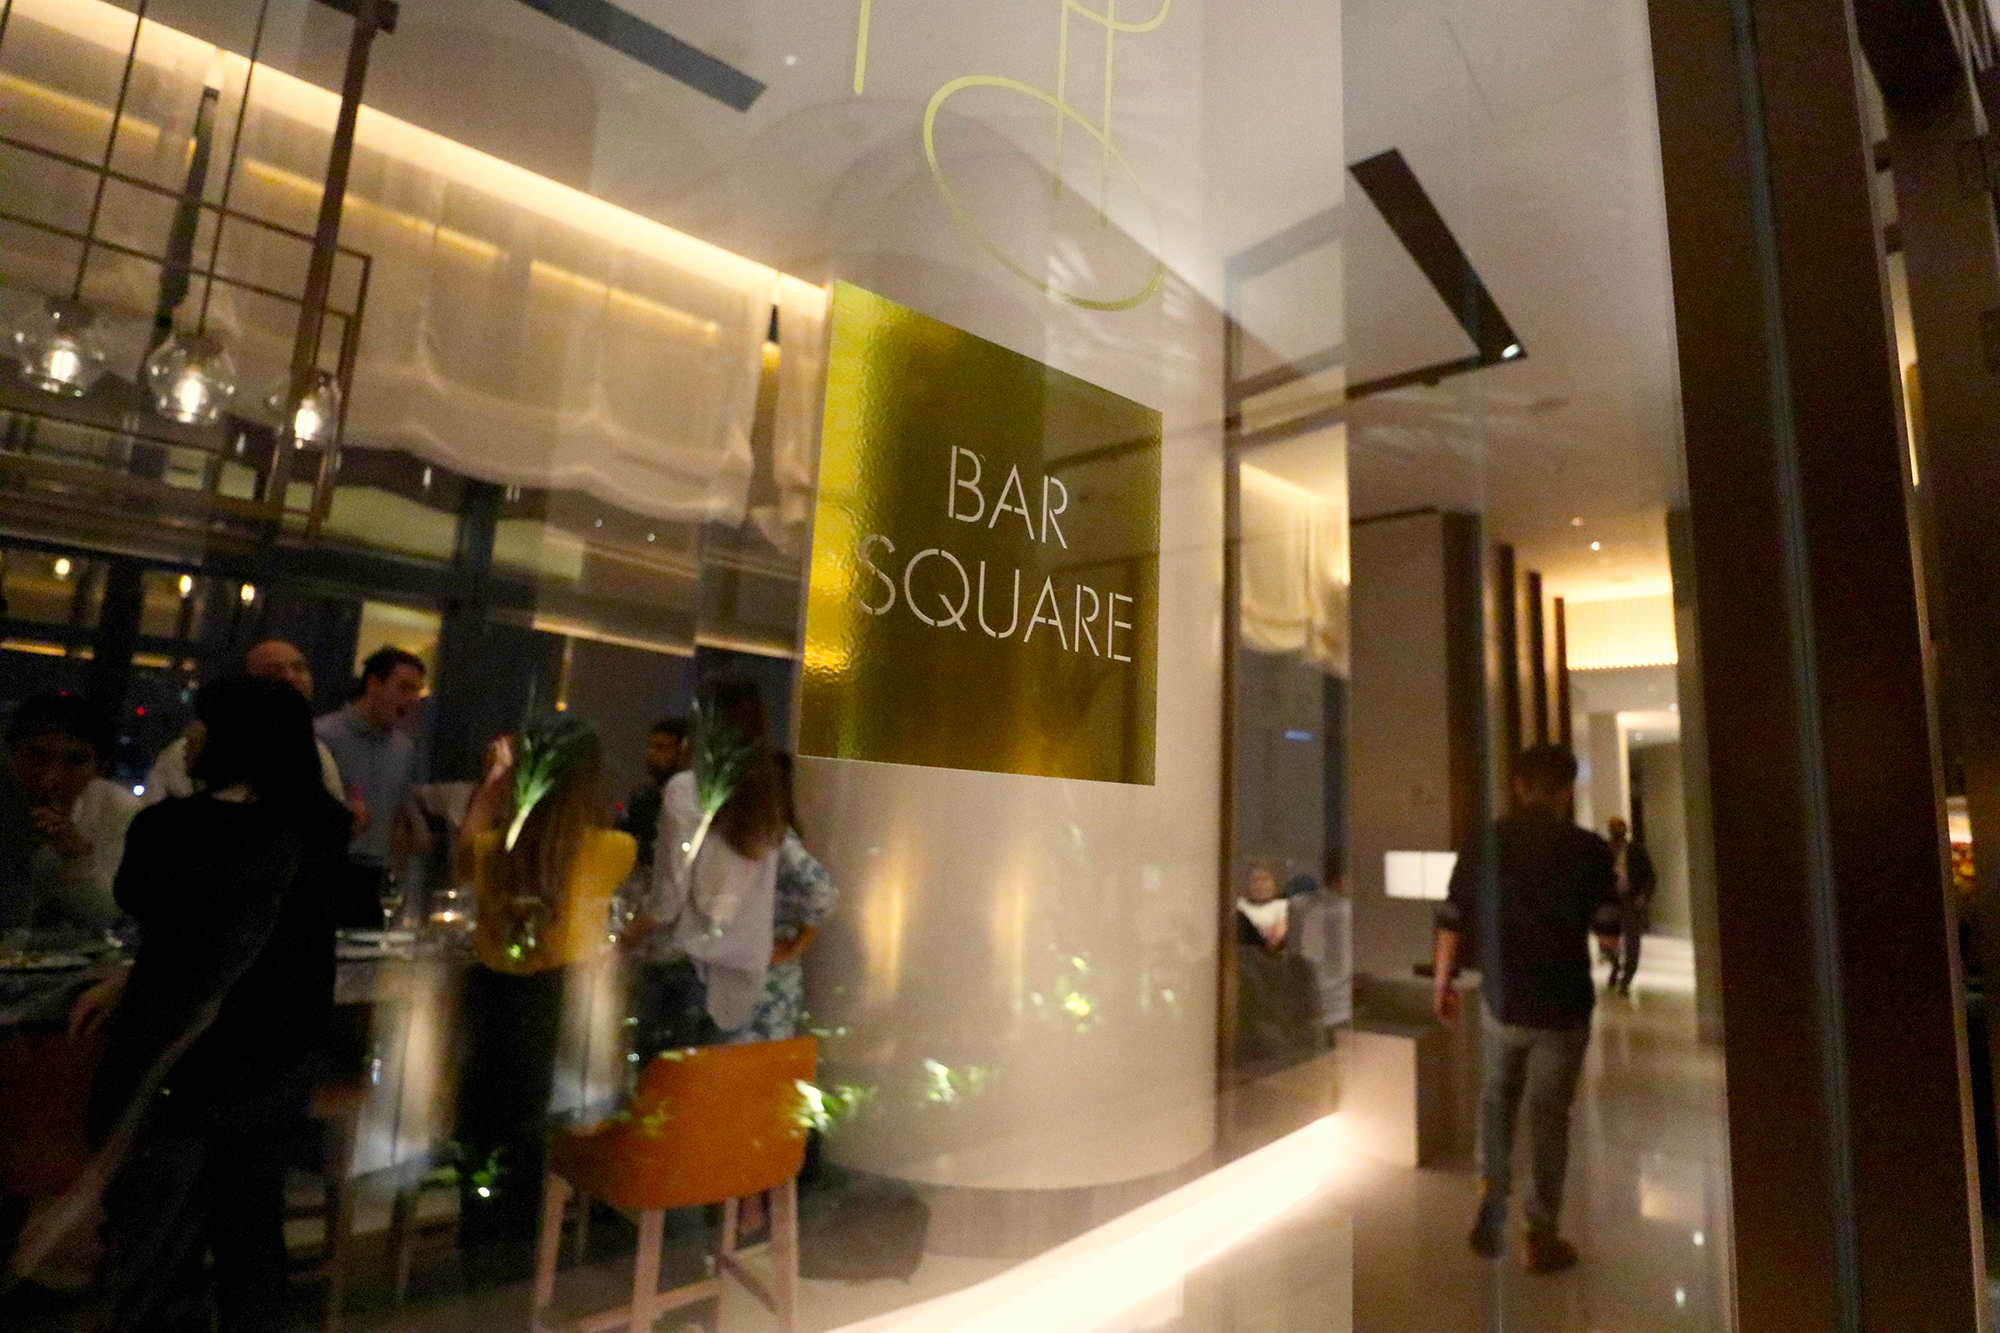 Bar Square Sign.jpg